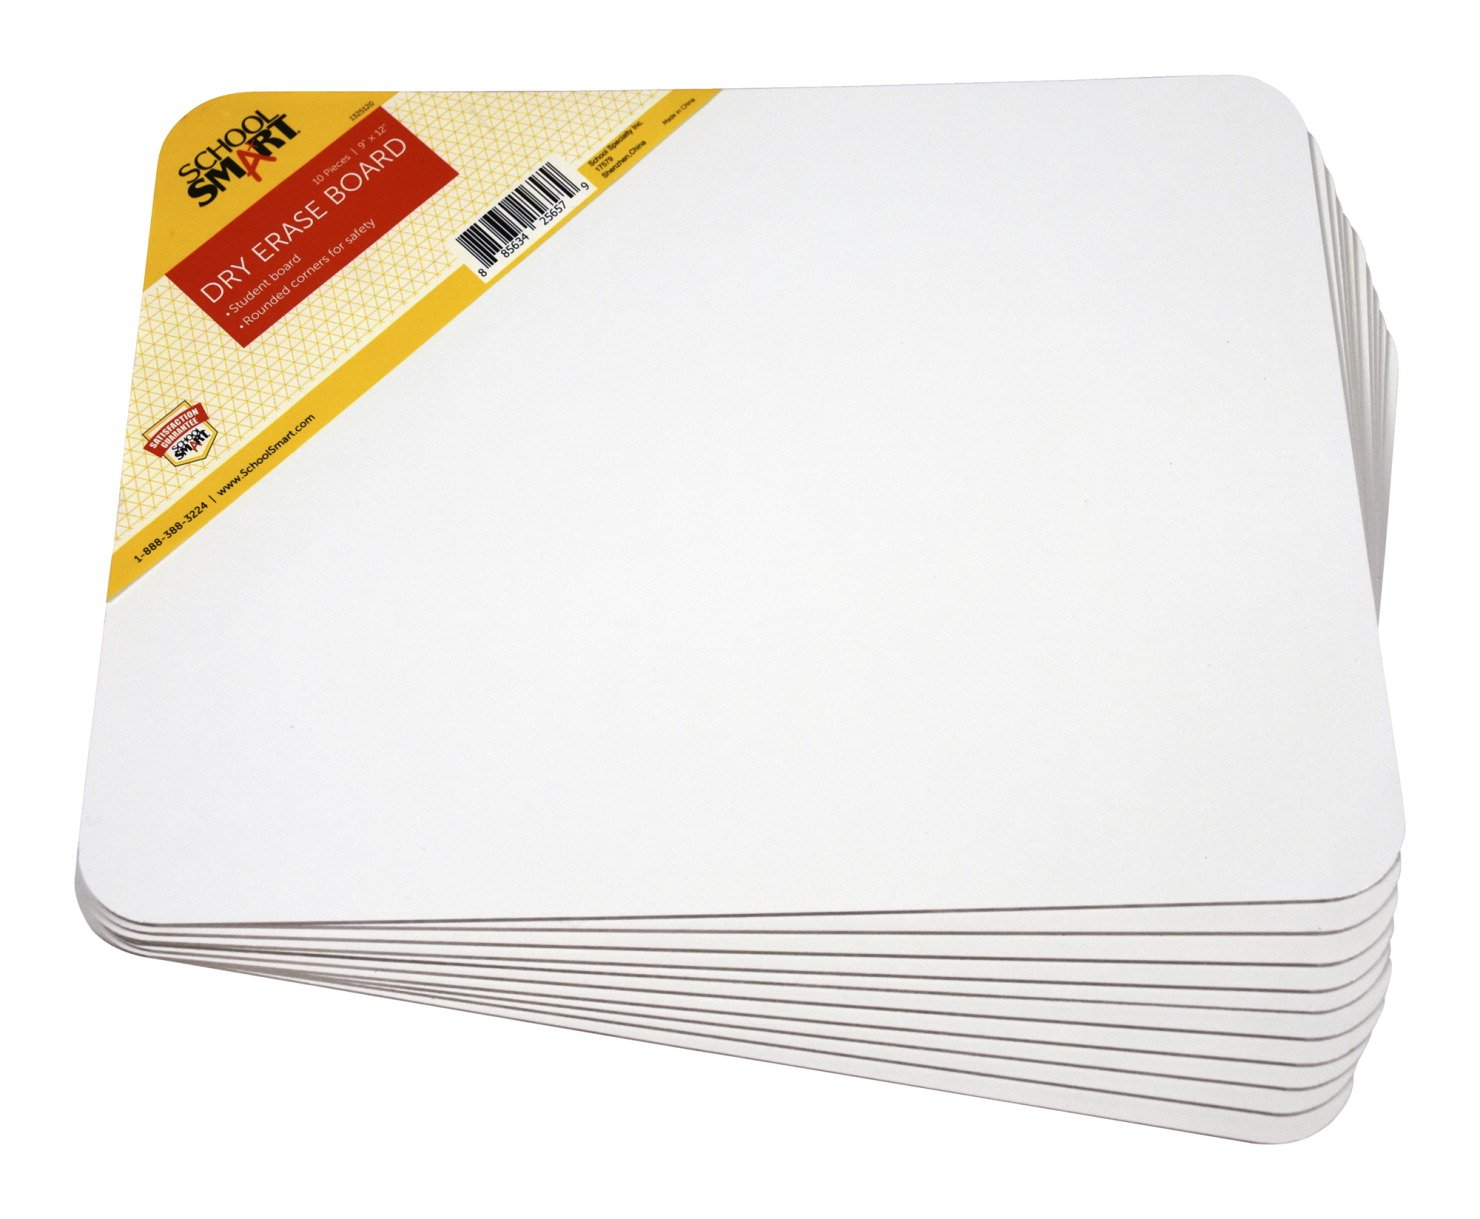 School Smart Dry Erase Unruled Pupil Boards - 9 x 12 - Set of 10